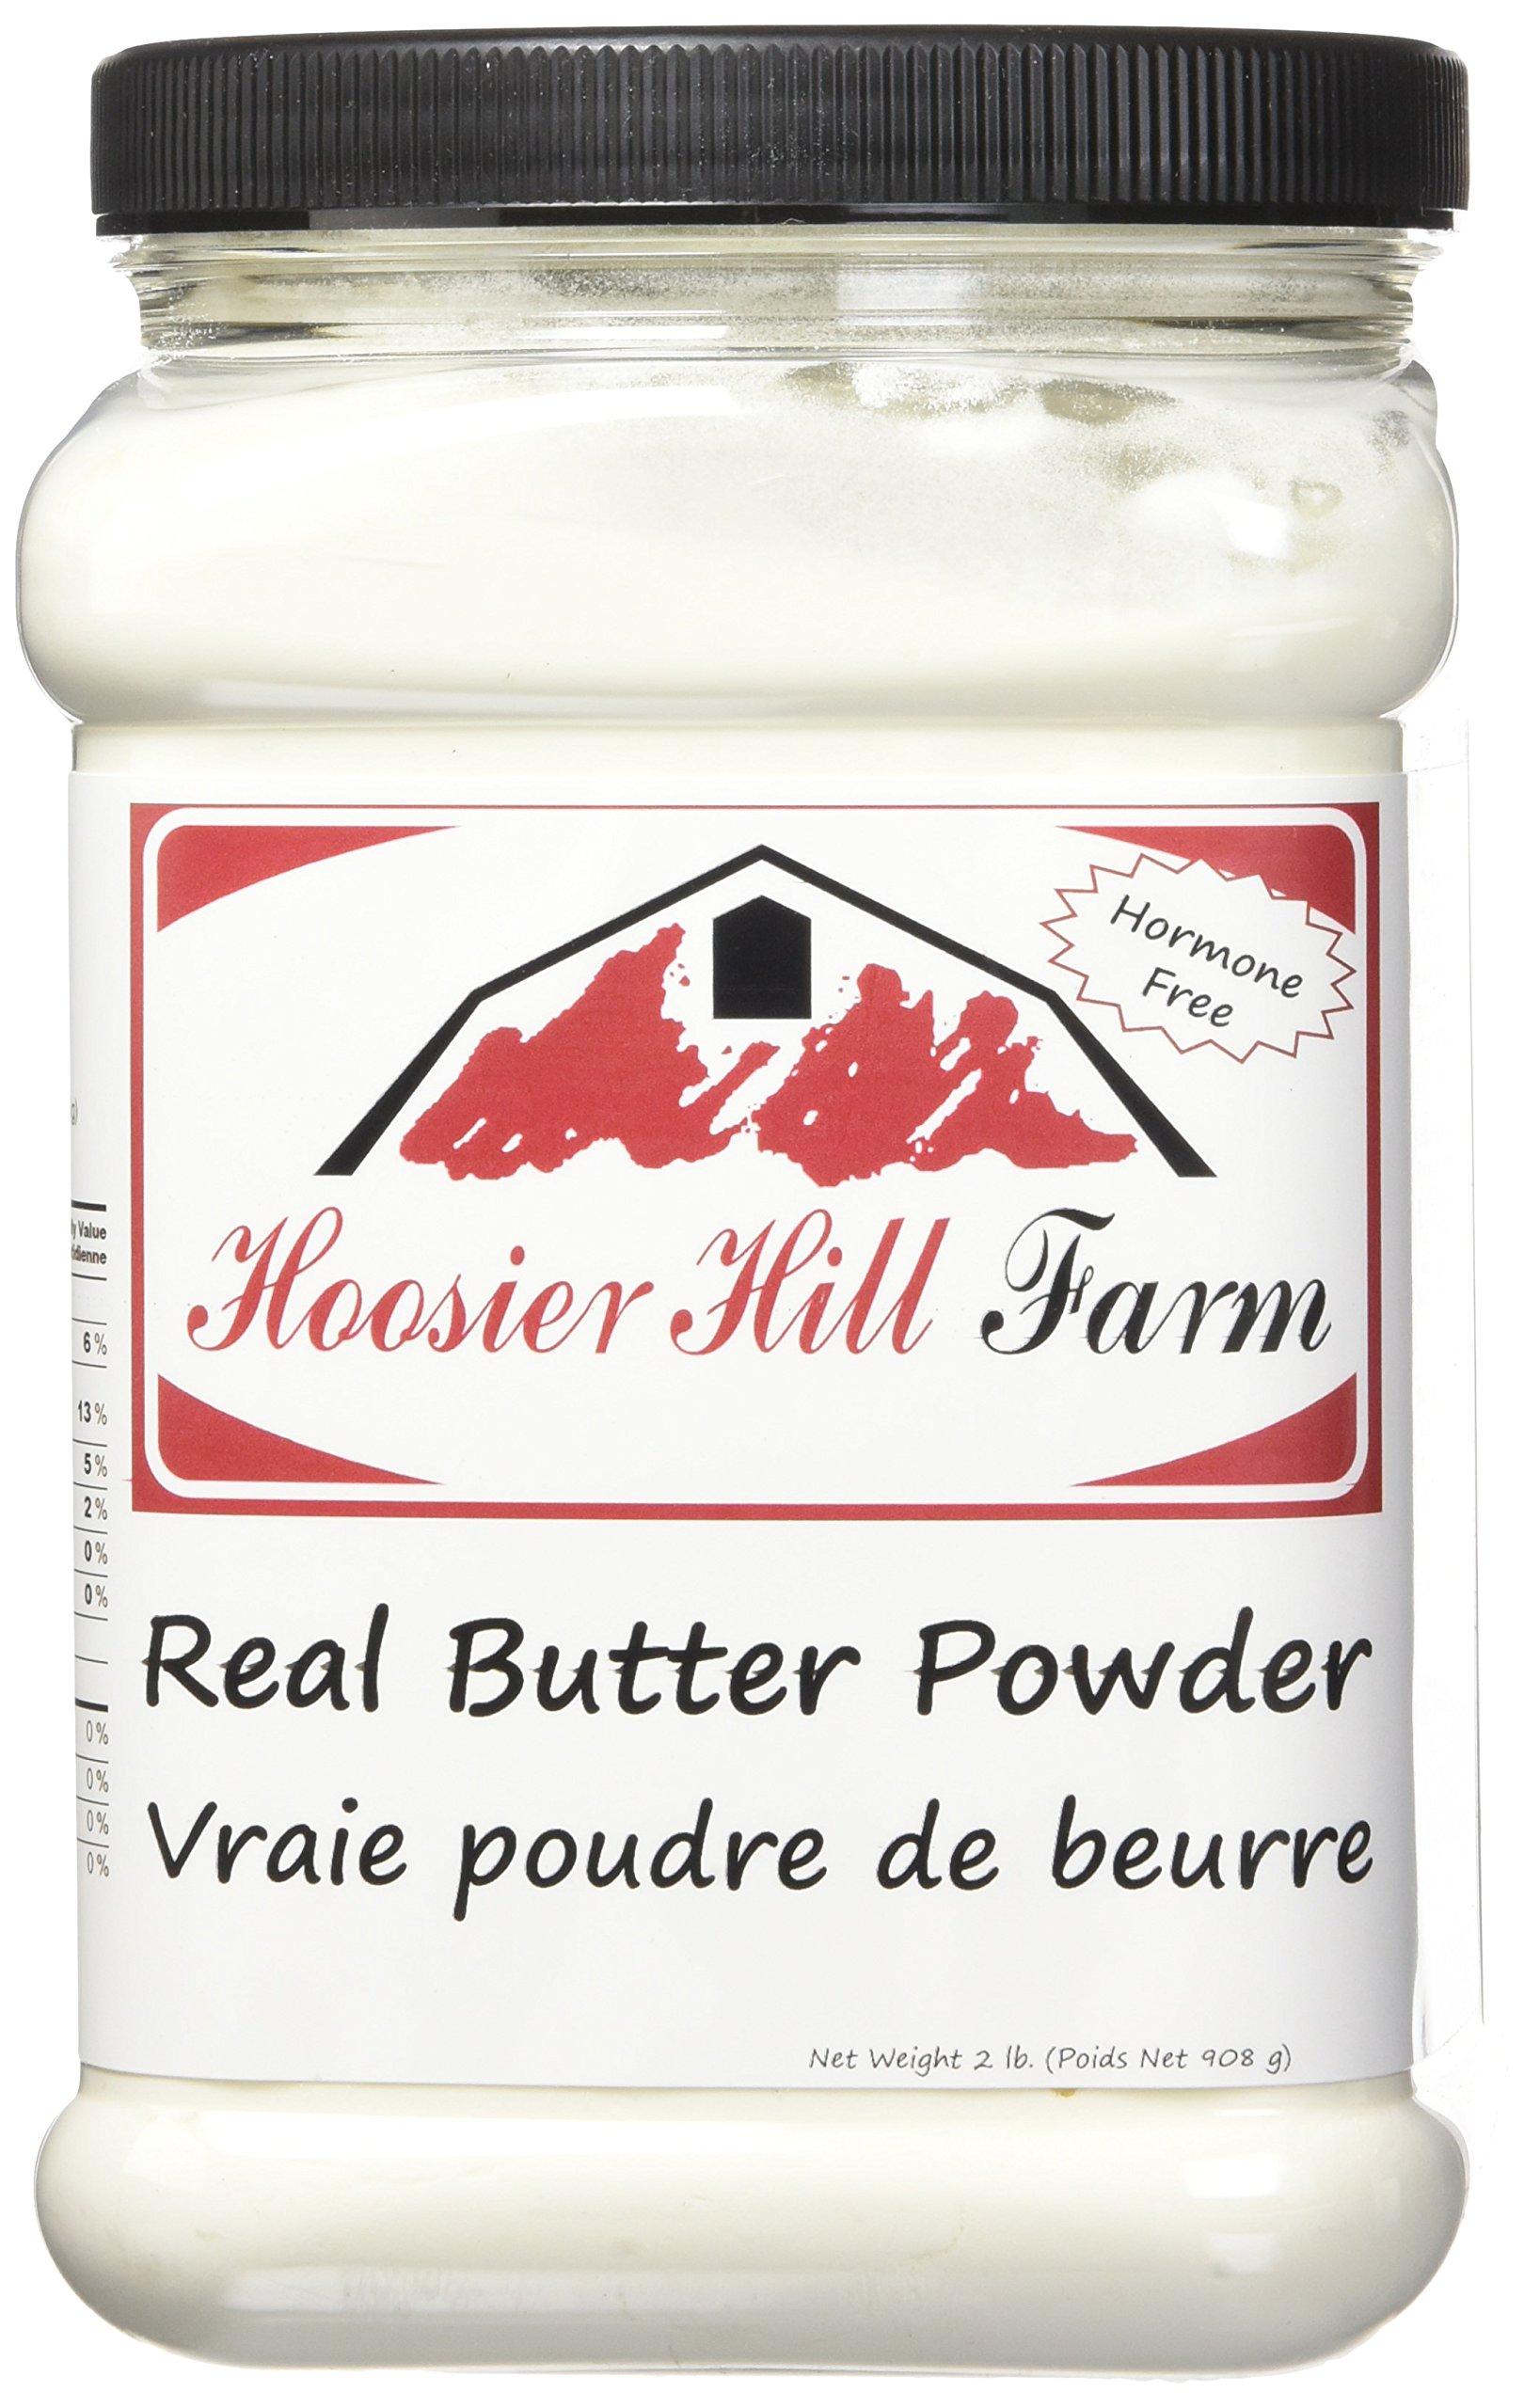 Hoosier Hill Farm Real Butter powder, Gluten and Hormone.free, 2 lbs